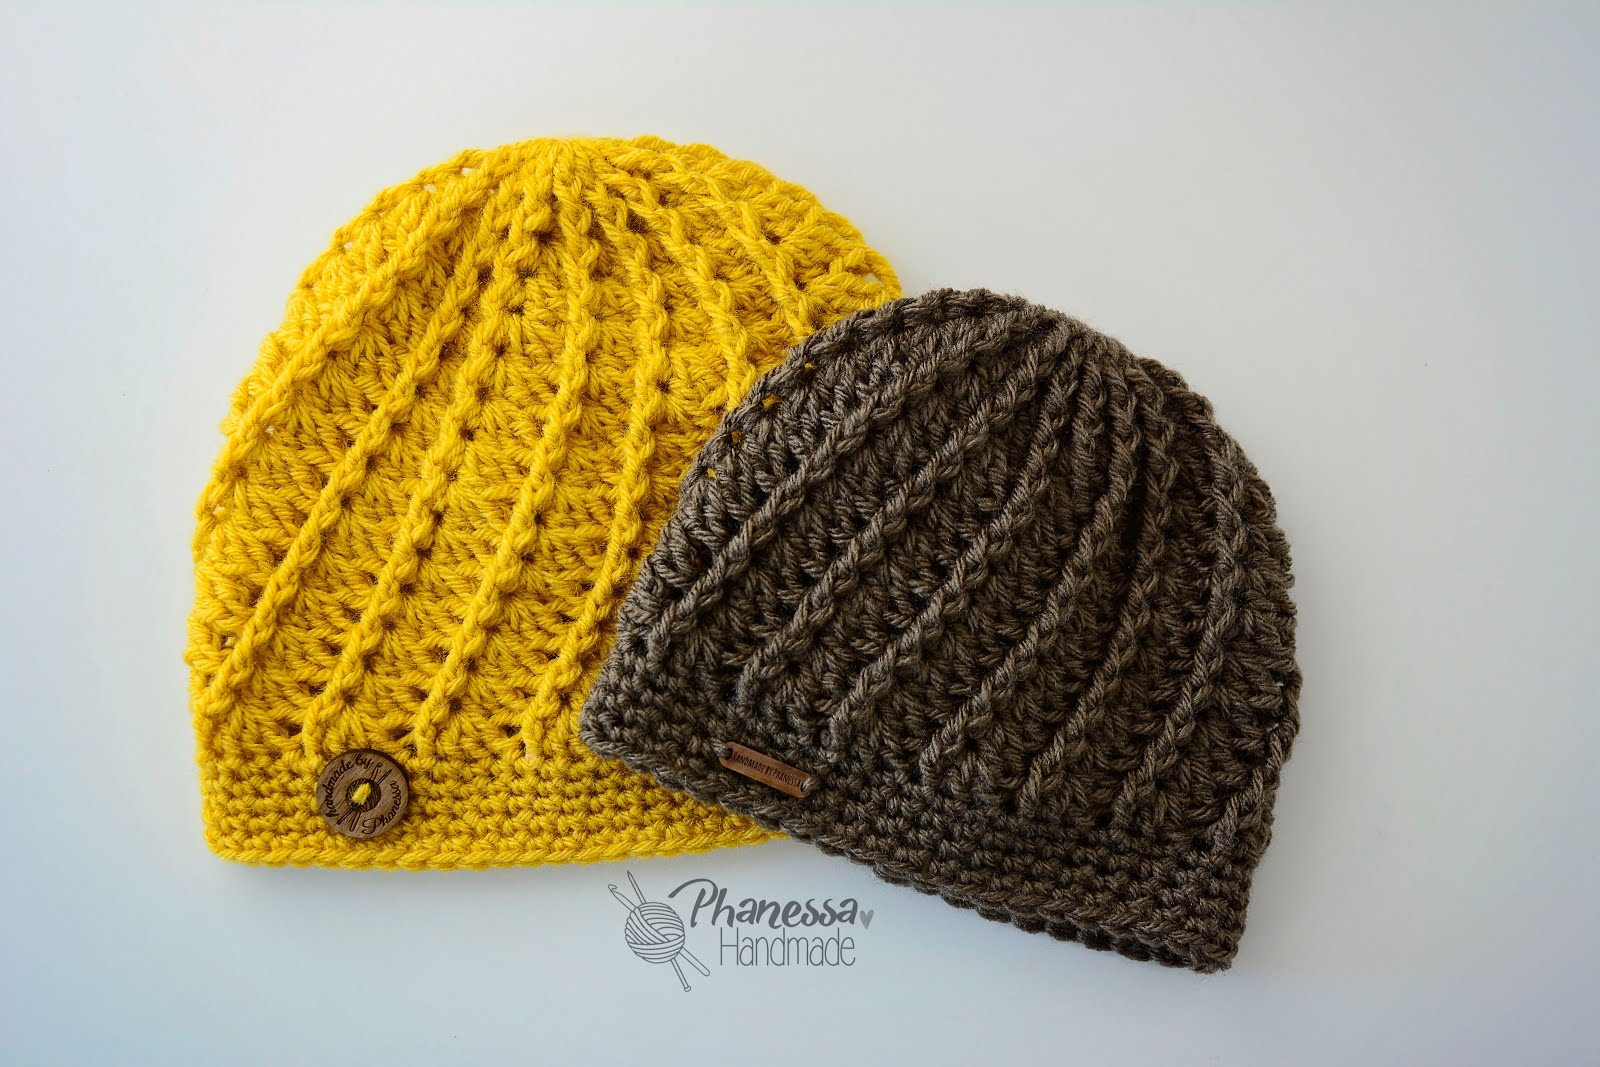 Handmade by Phanessa  Crochet Spiral Hat f0c762859cf